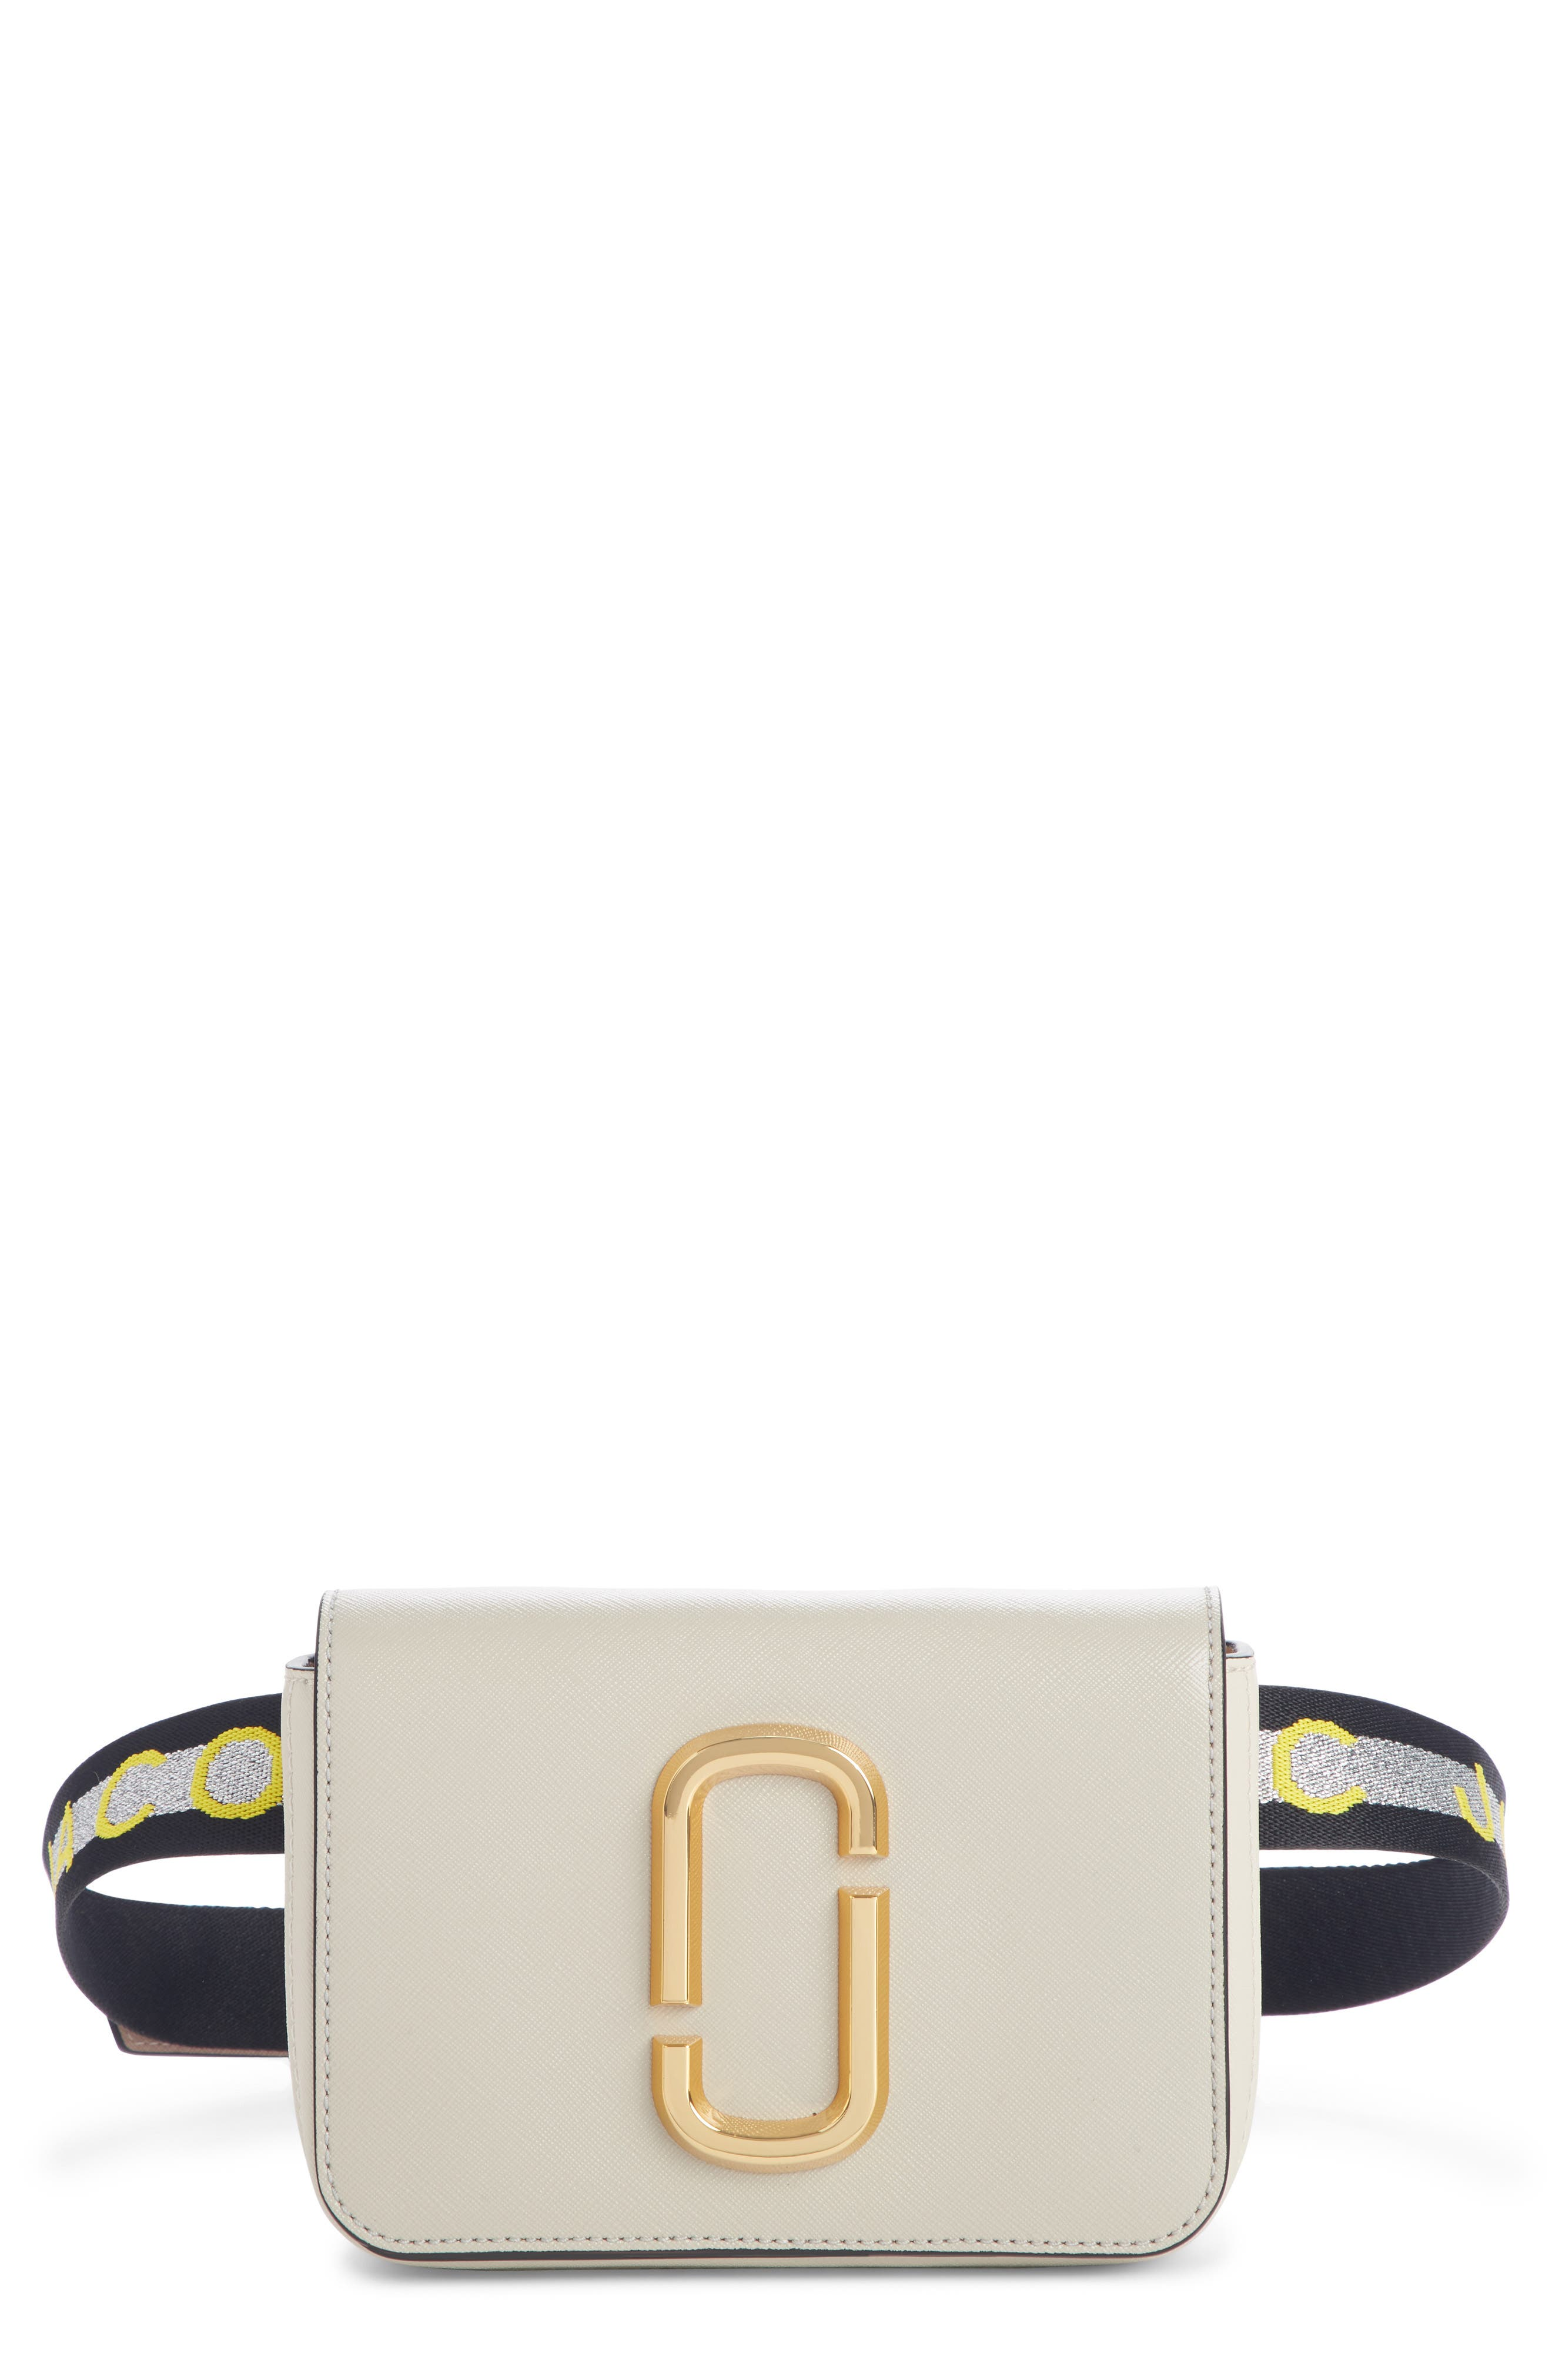 1850c23b32d78 MARC JACOBS Crossbody Bags